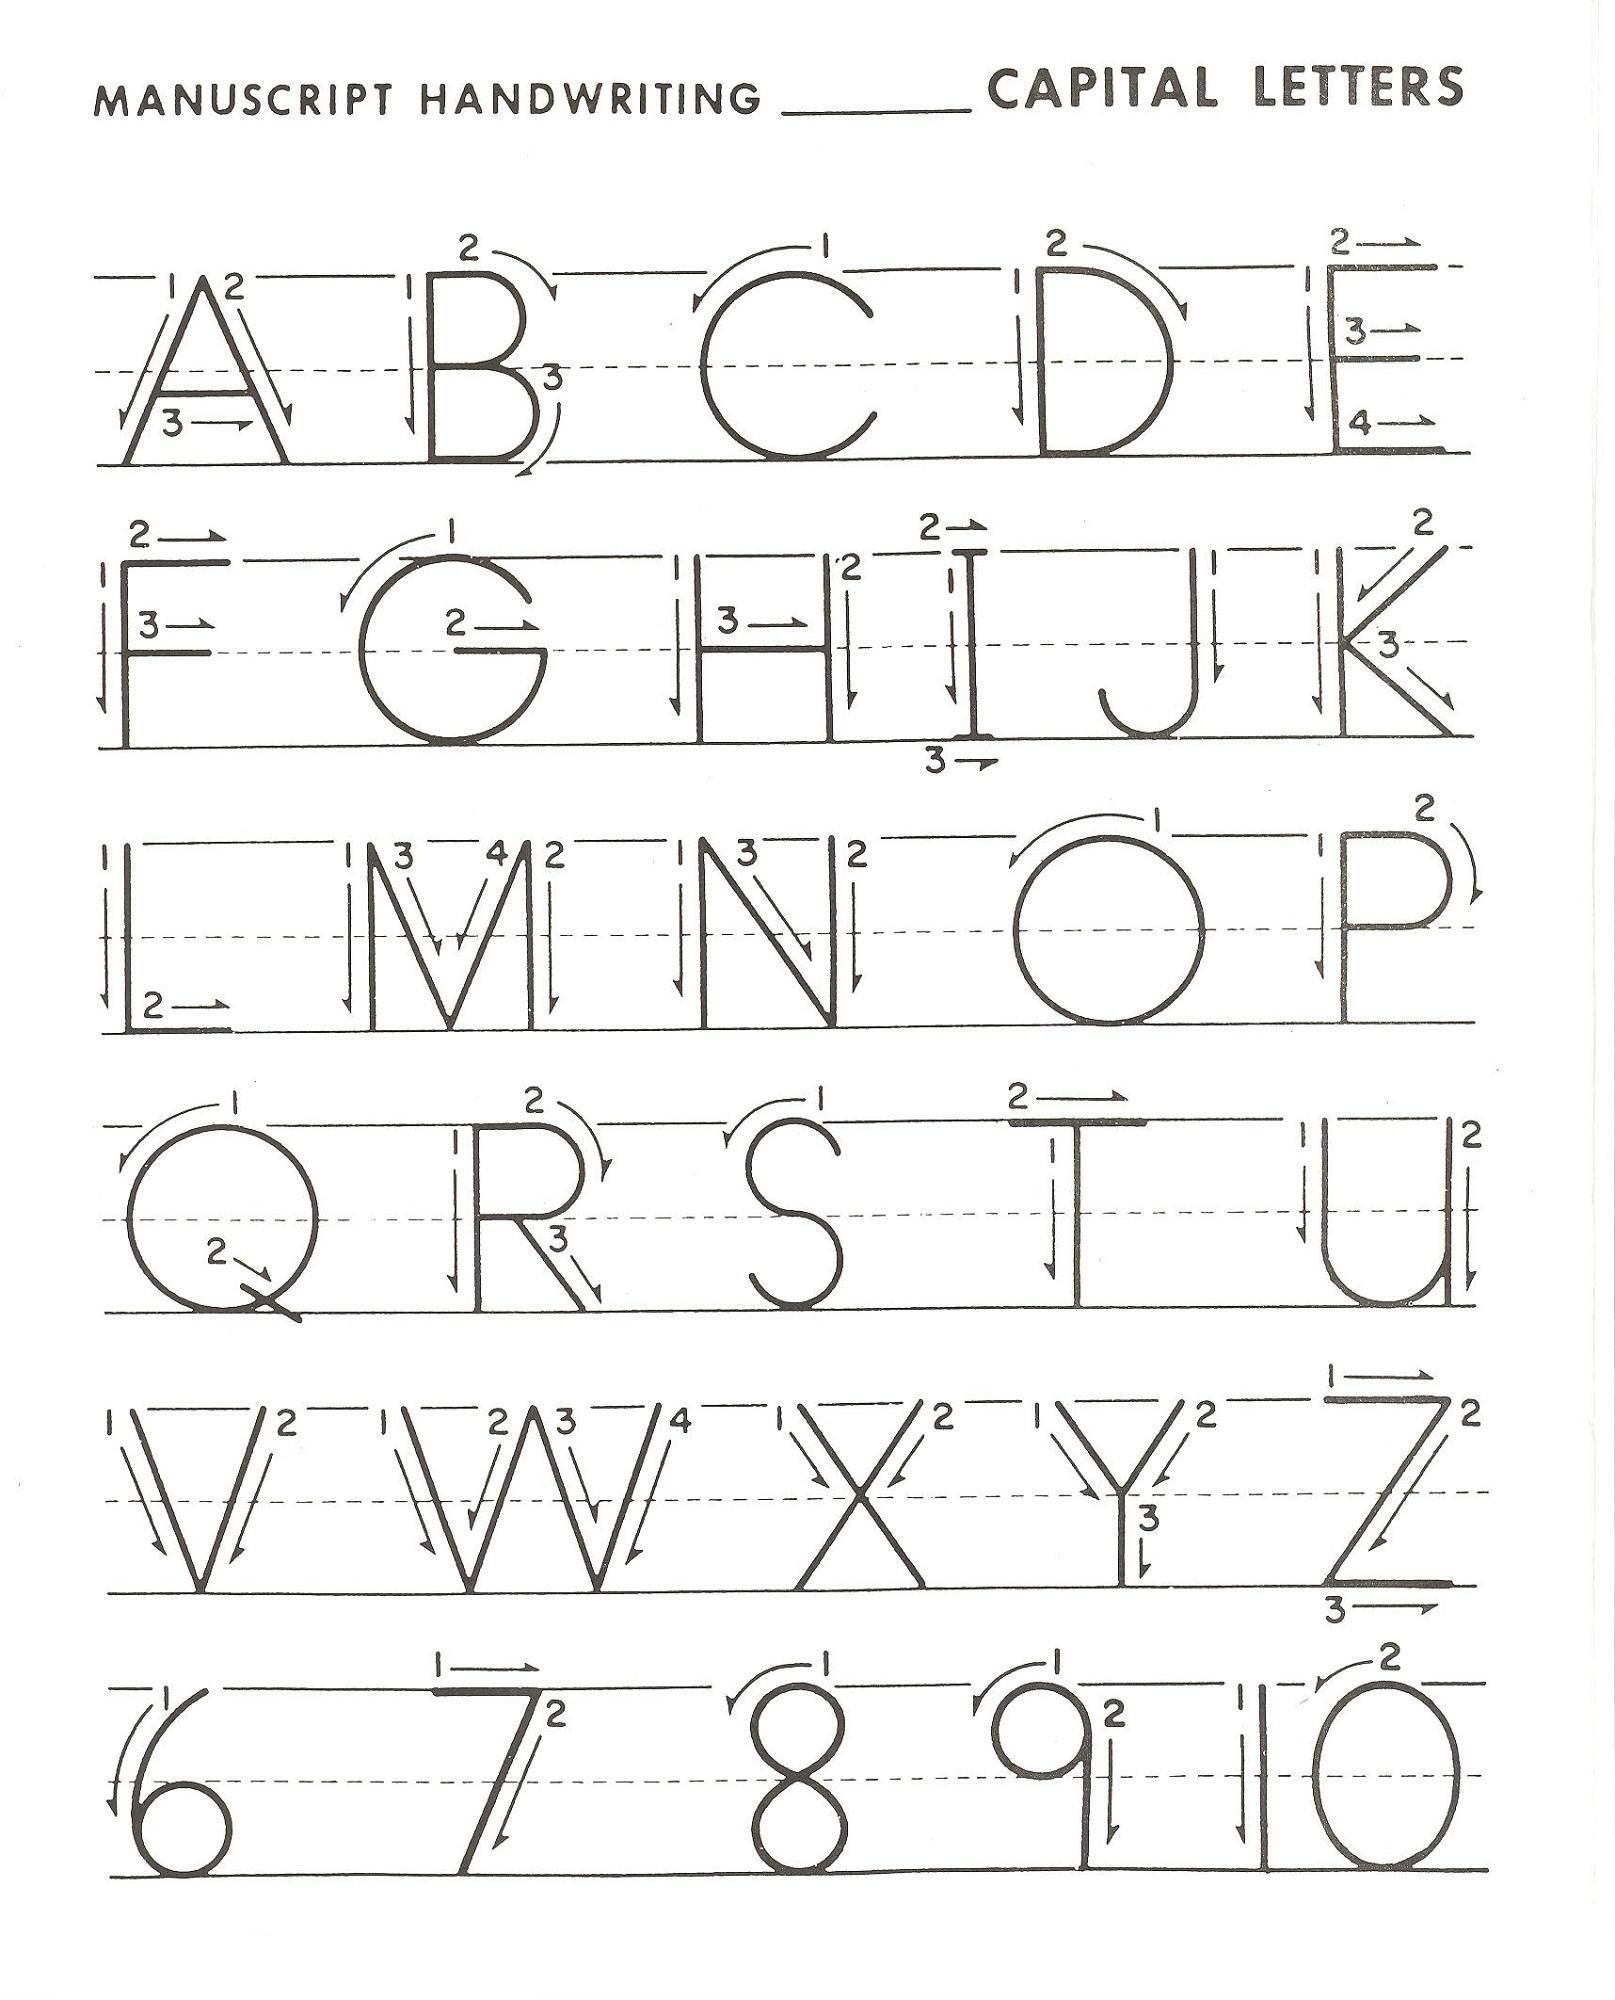 Alphabet Capital Letters Worksheet In